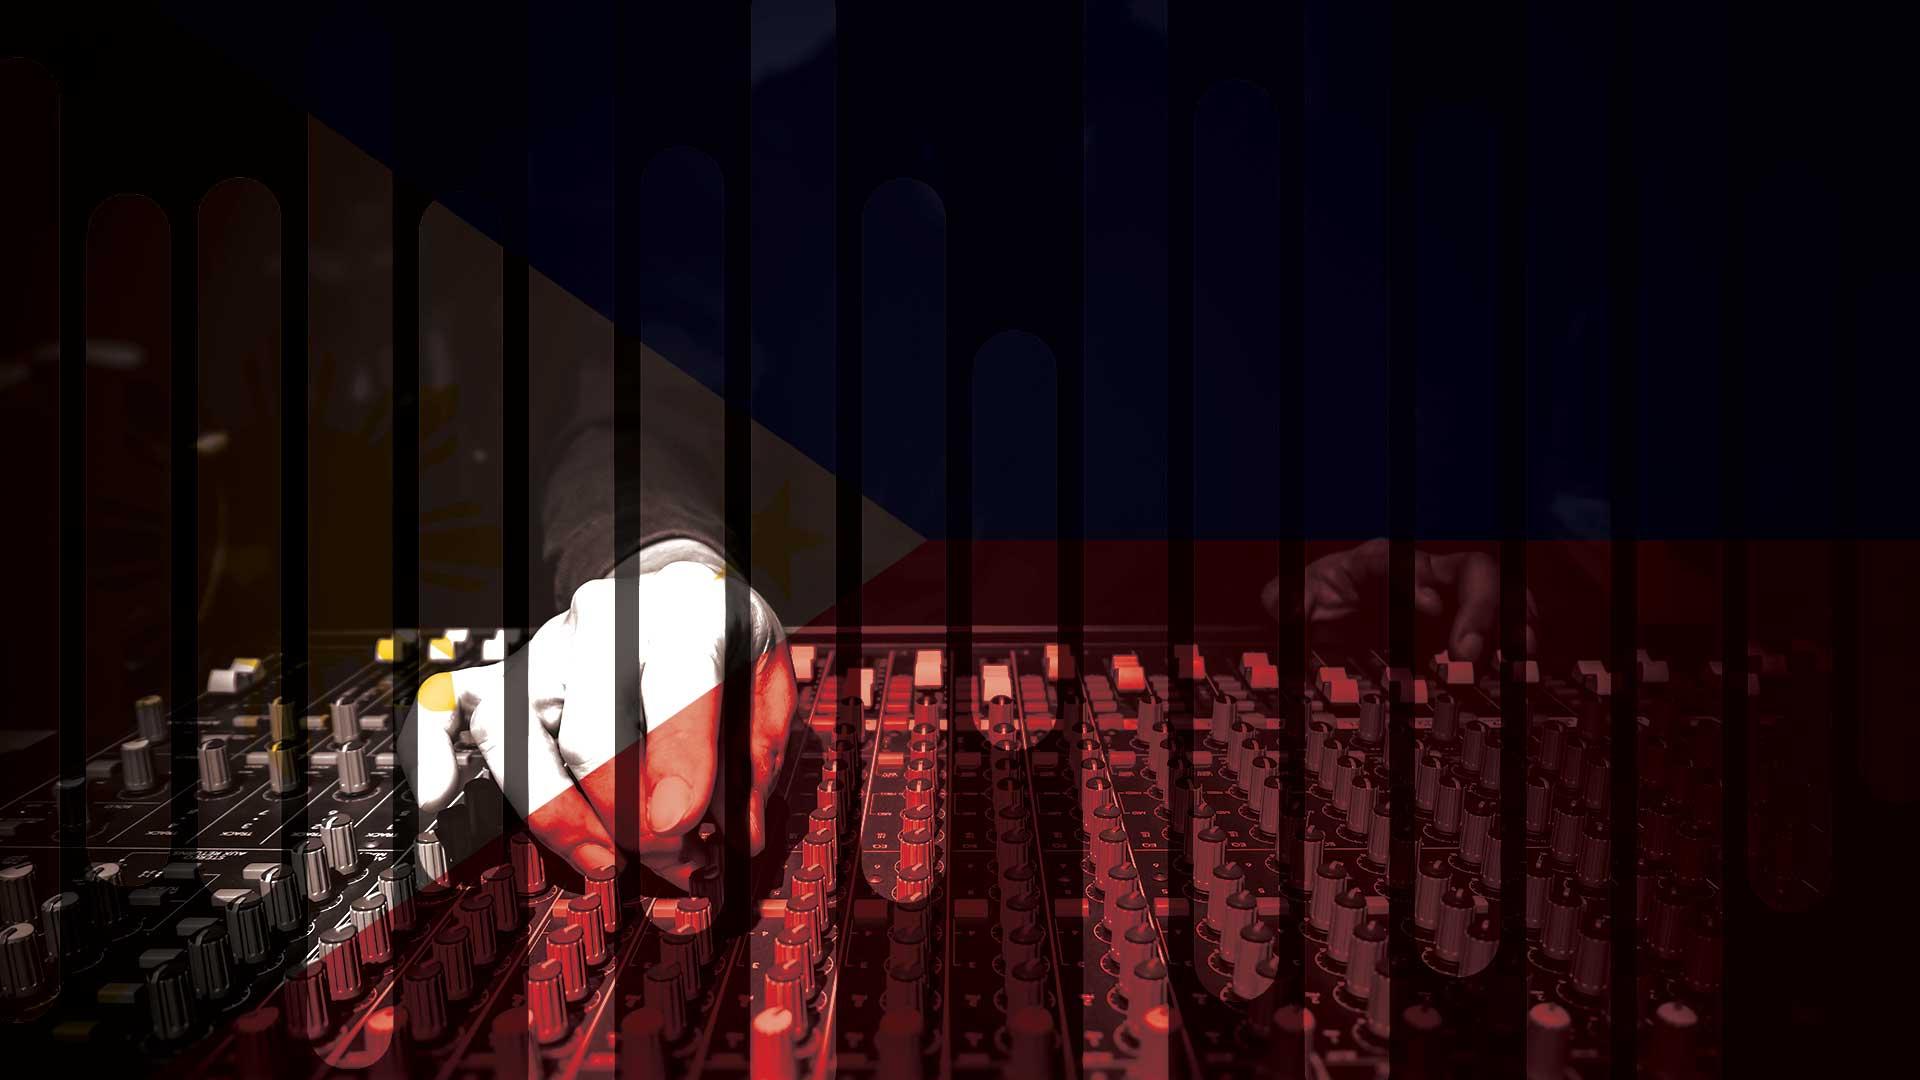 Voice-Over Services Philippines - Voquent